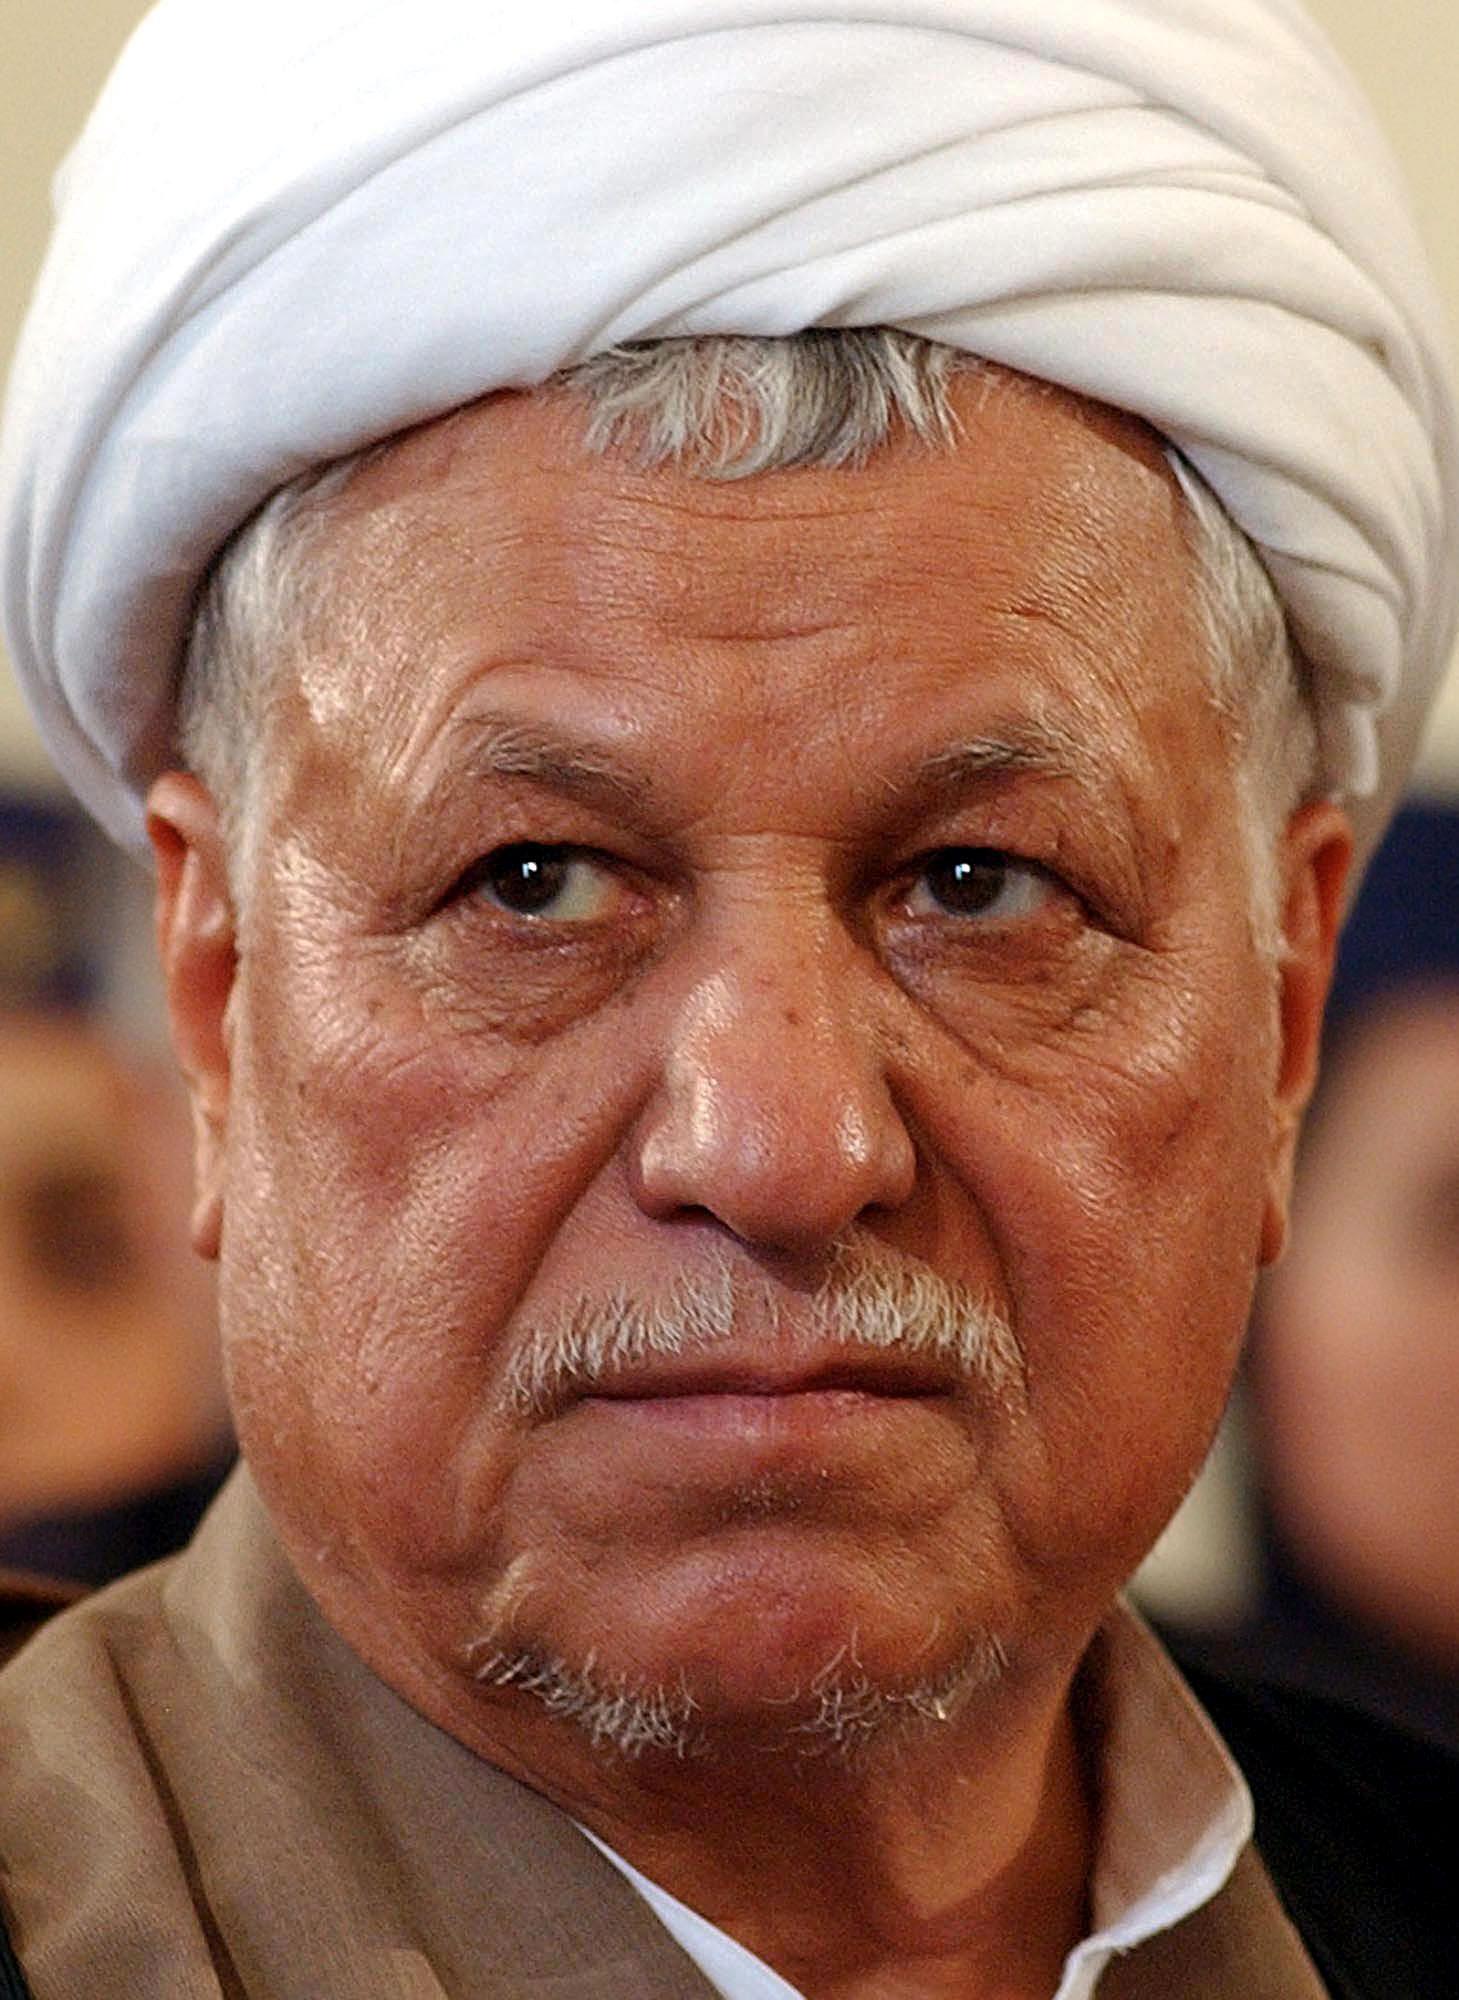 TIMMERMAN: Iran's free-election farce - Washington Times